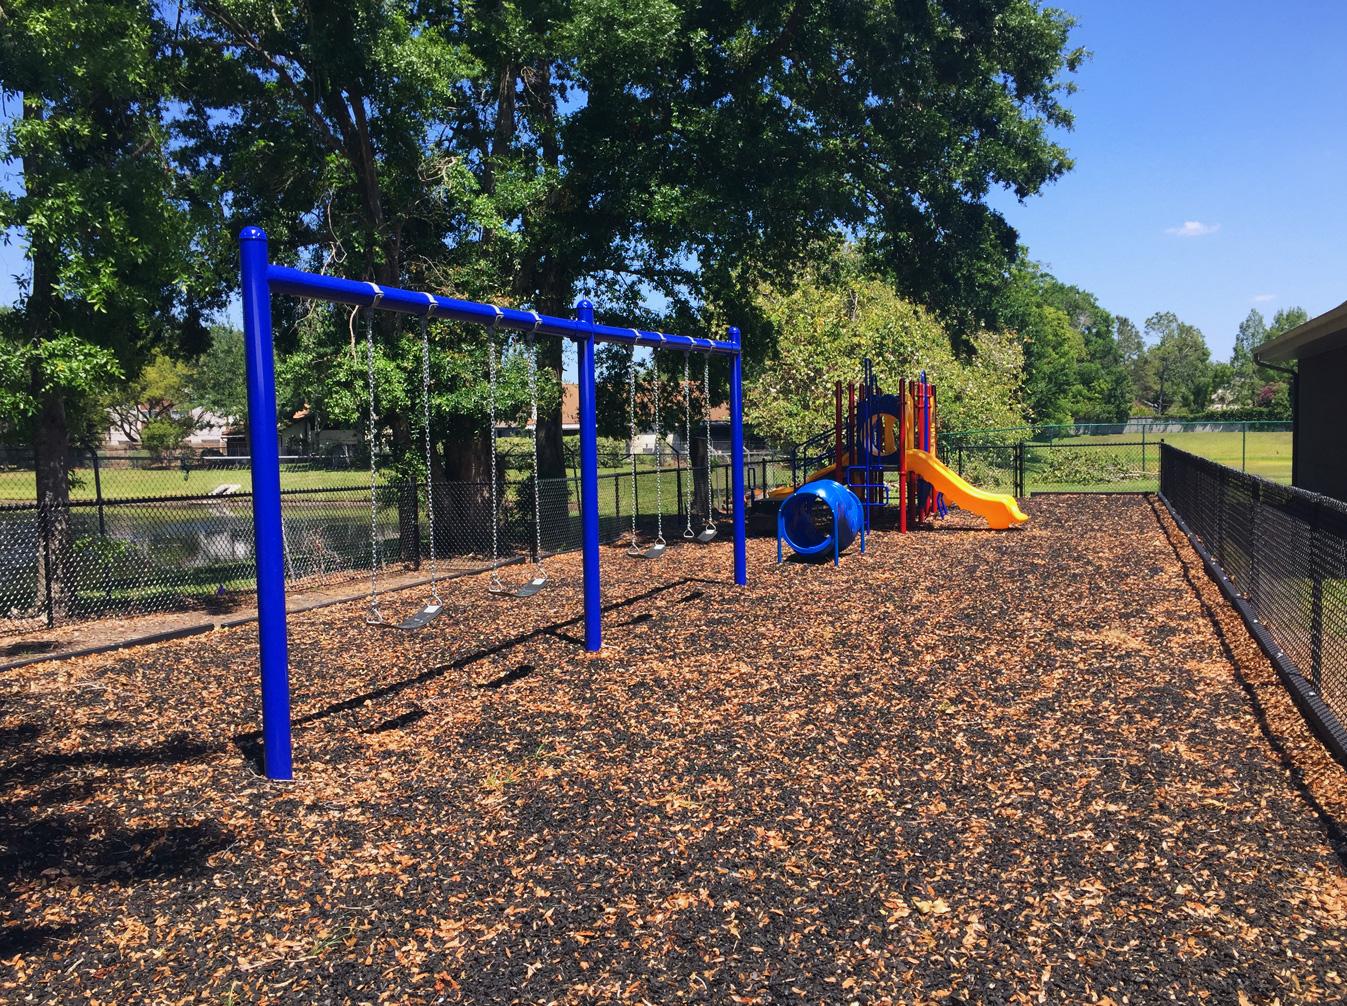 image of playground installation within gate enclosure